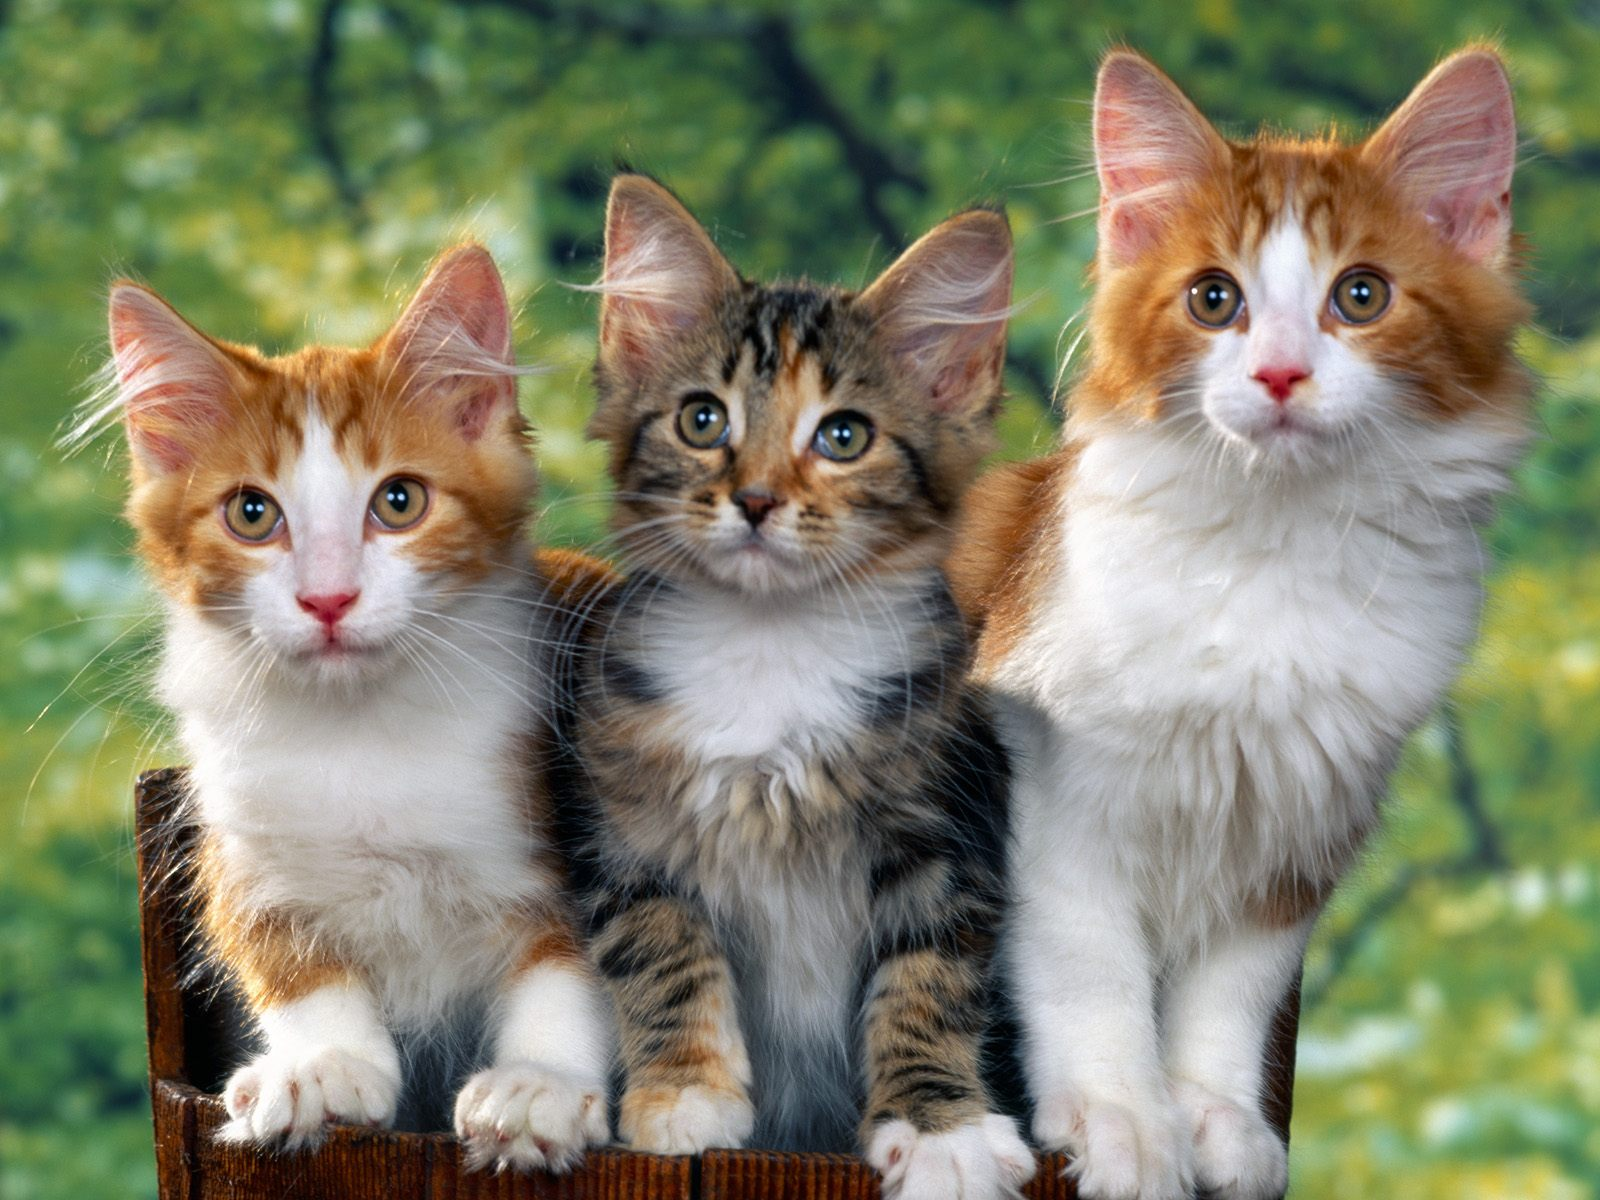 Download Wallpaper Gambar Kucing Lucu Kumpulan Wallpaper